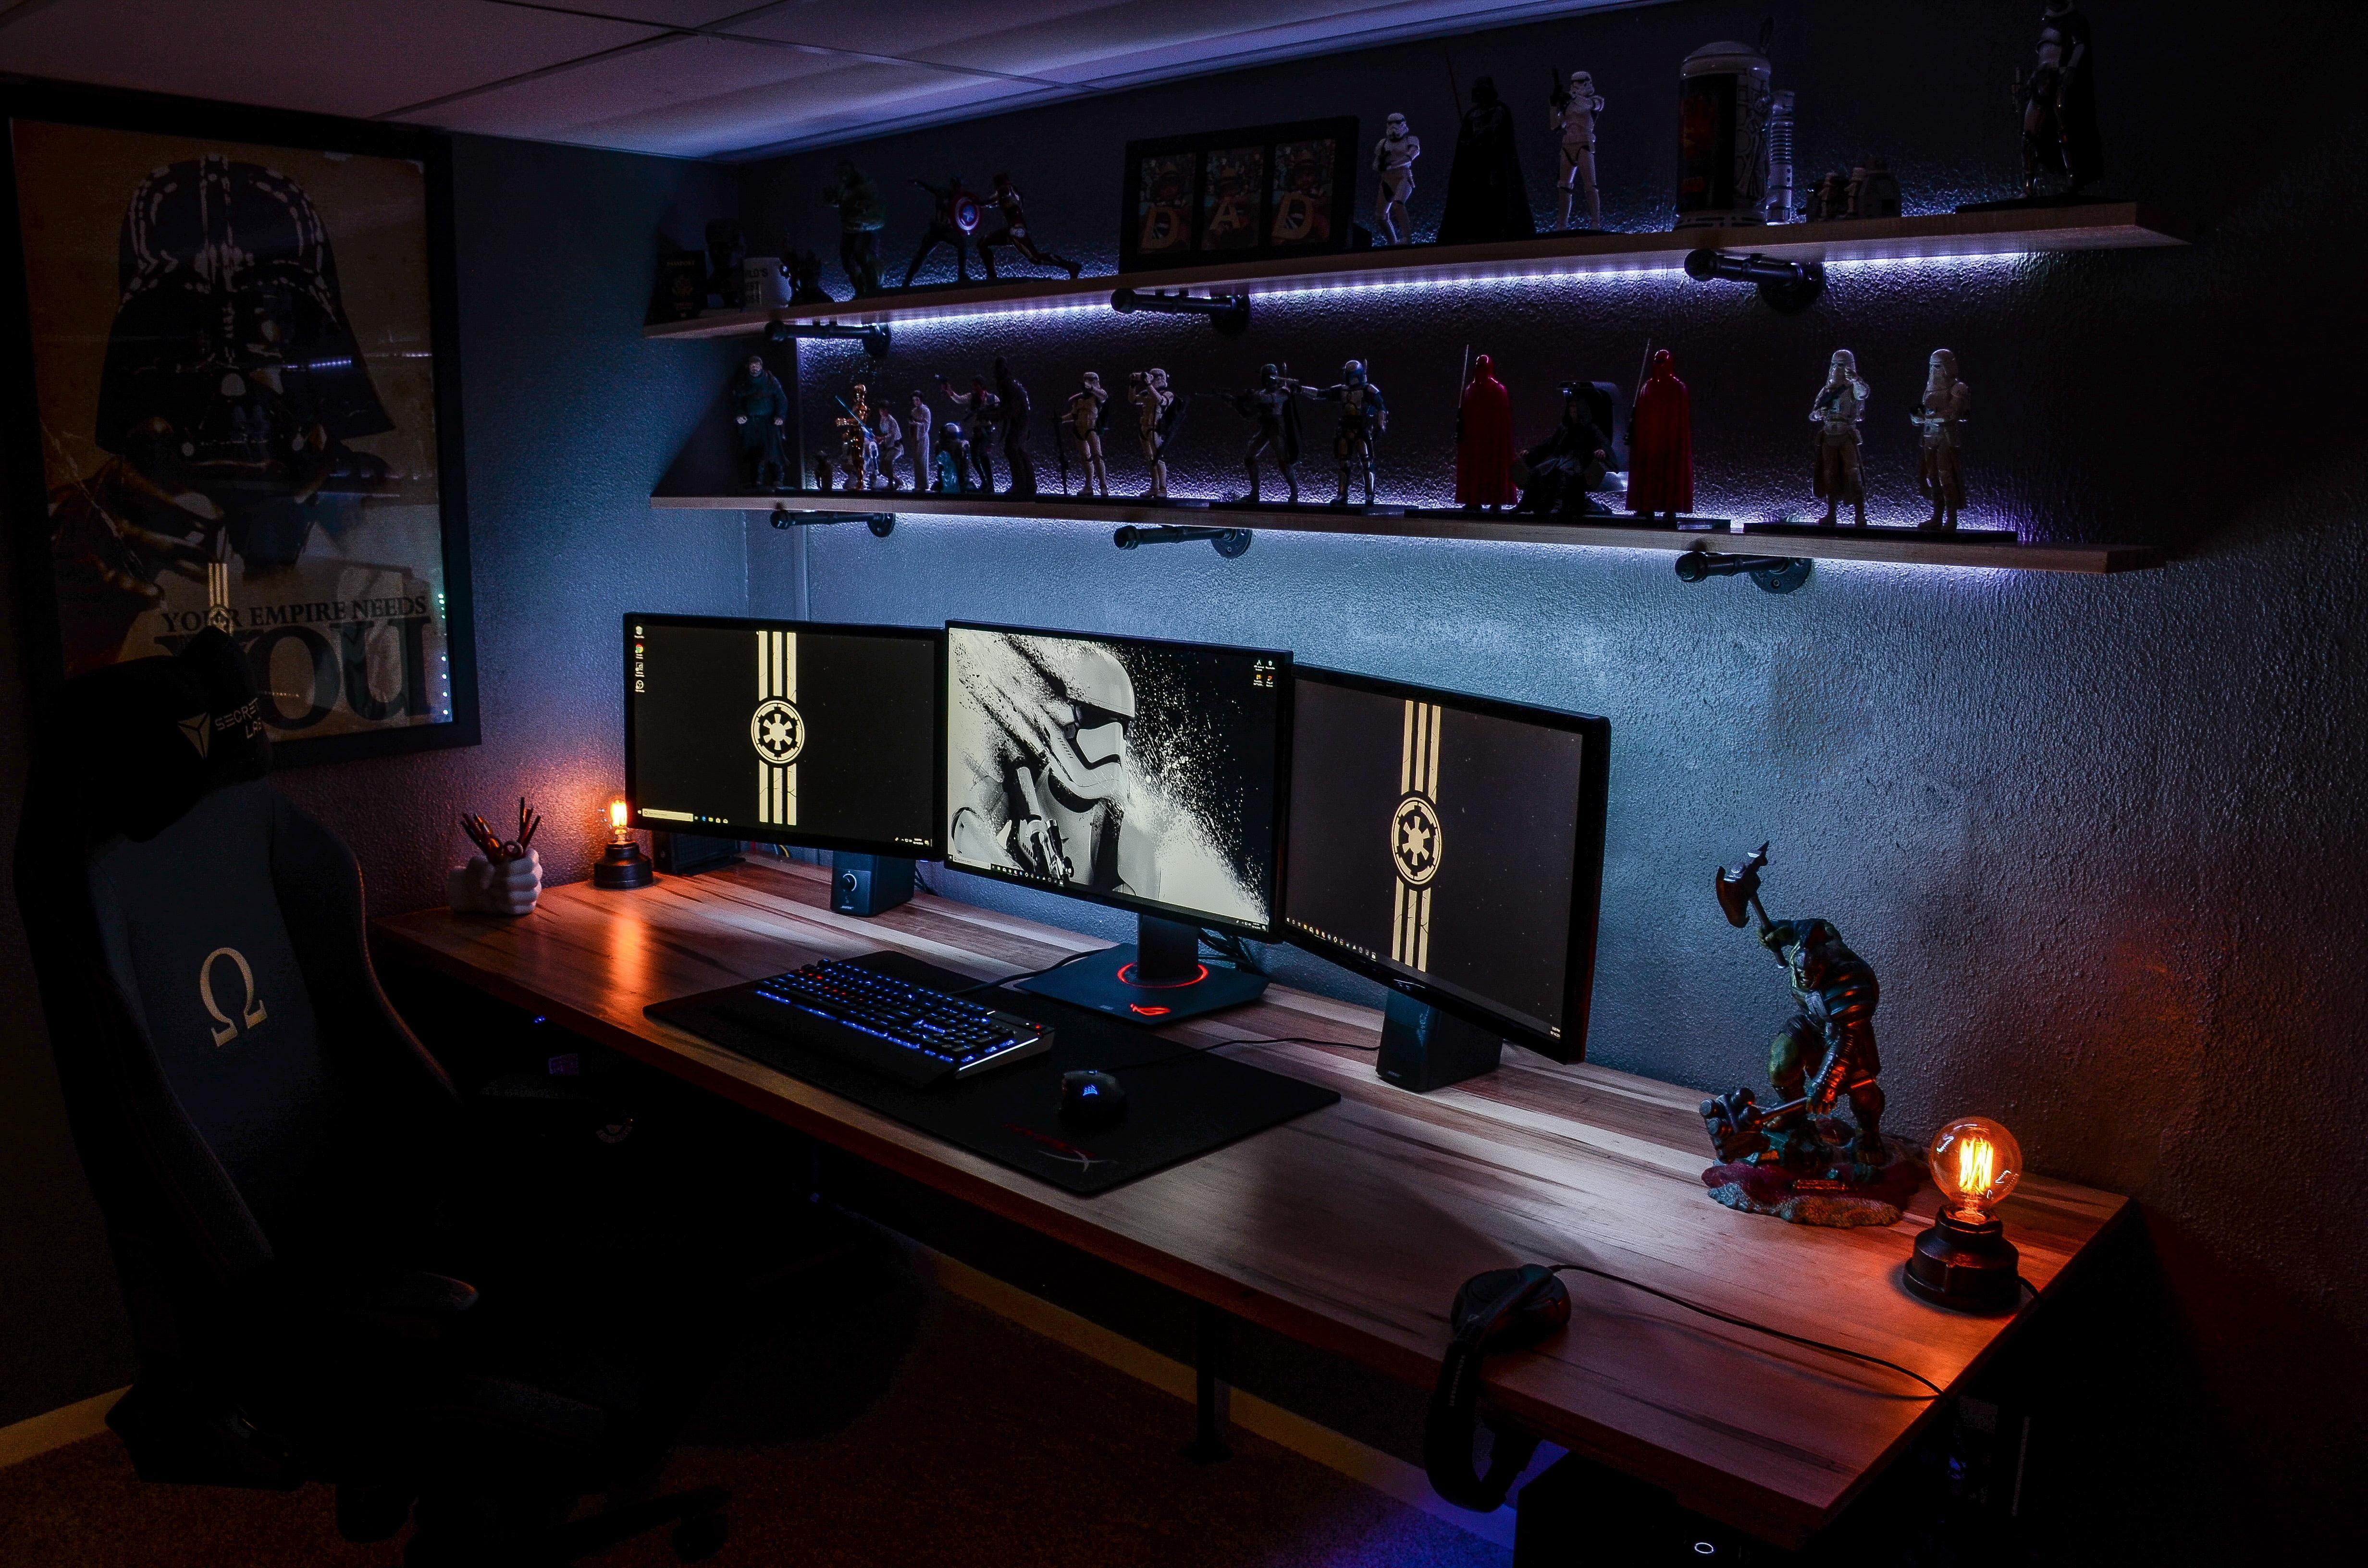 New Setup (Yes I do love Star Wars) Gaming room setup